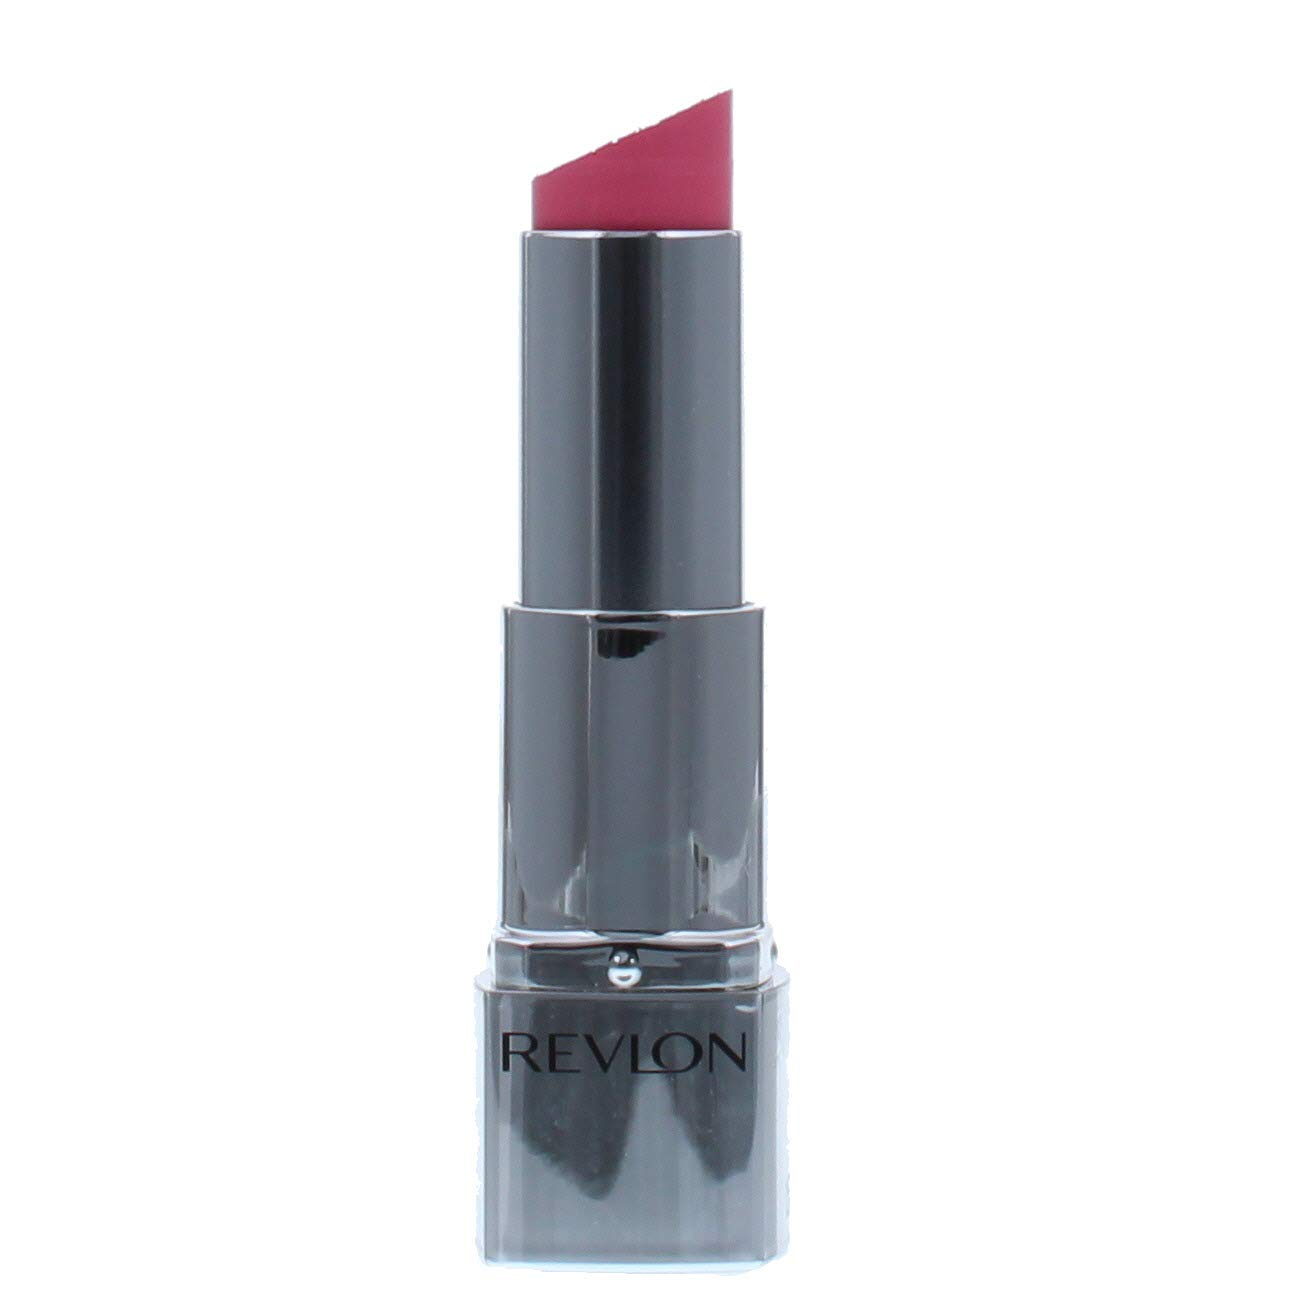 Revlon Ultra HD Lipstick, 845 Peony, 0.1 Ounce